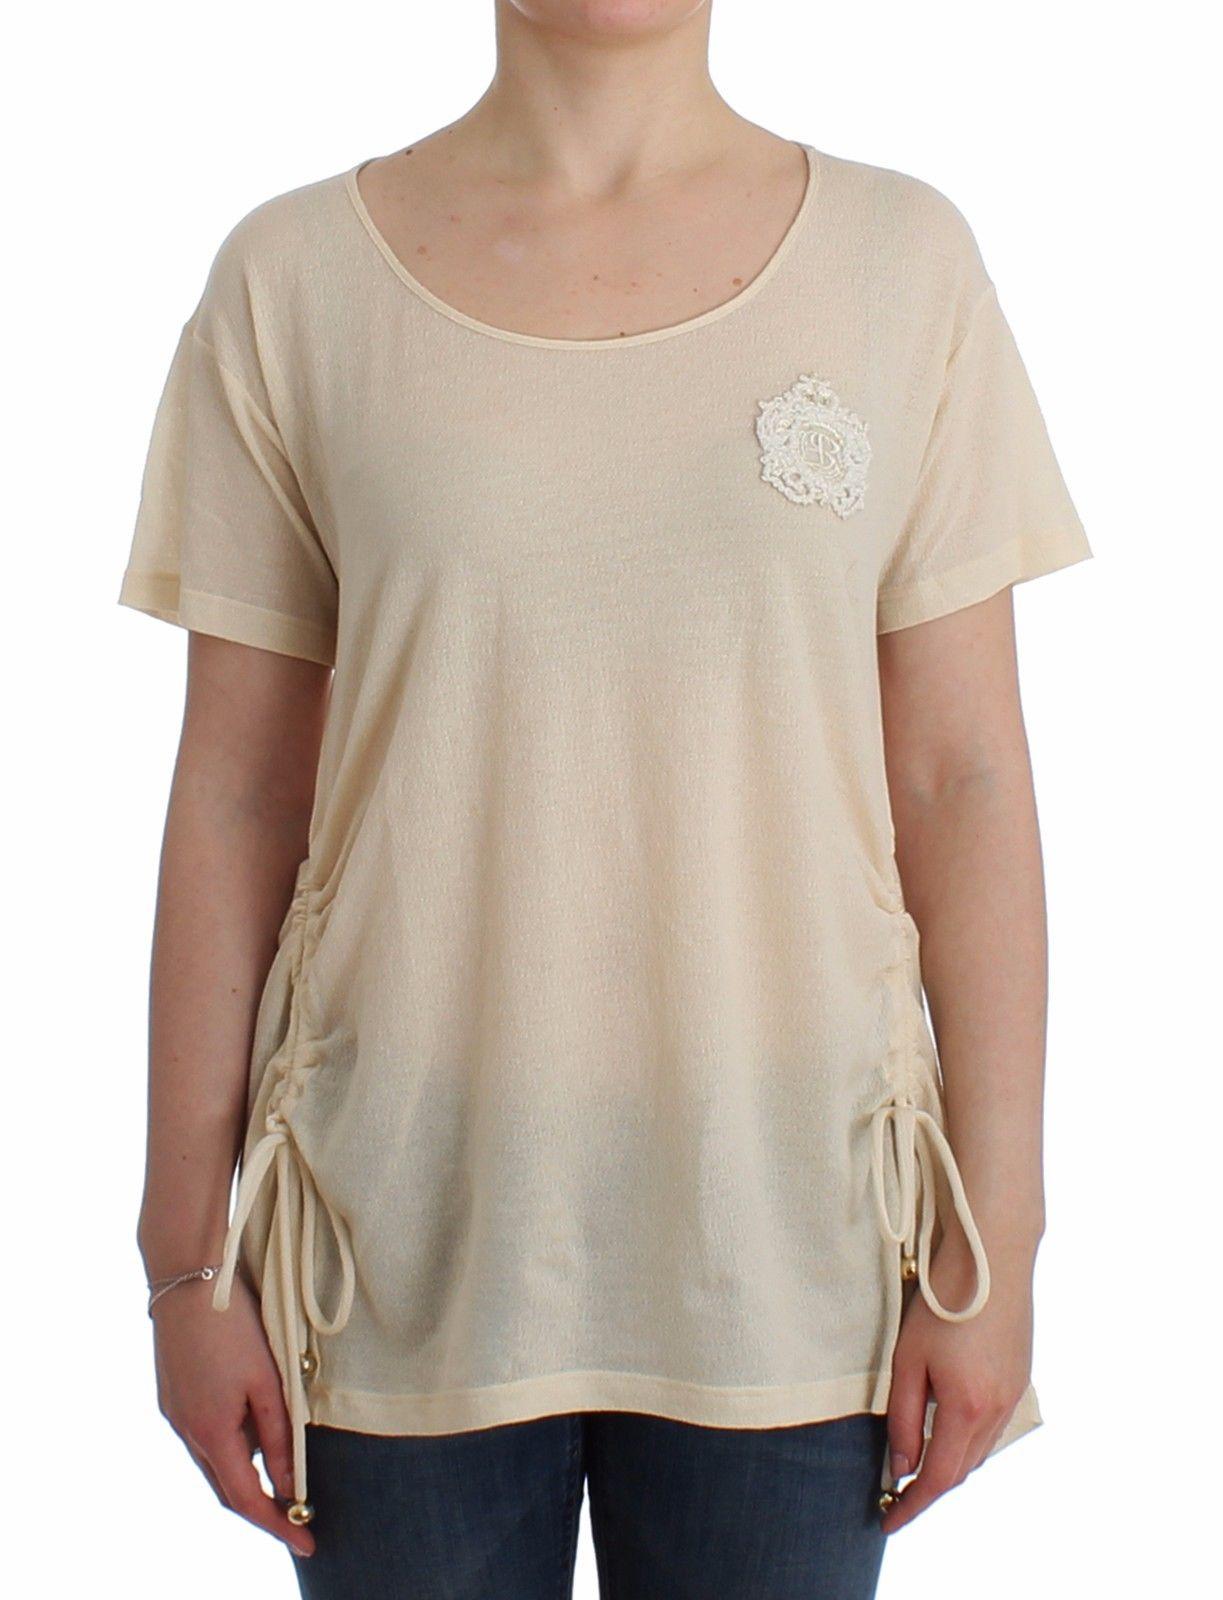 Ermanno Scervino Women's Maxi T-Shirt Top White SIG12027 - IT42 | S